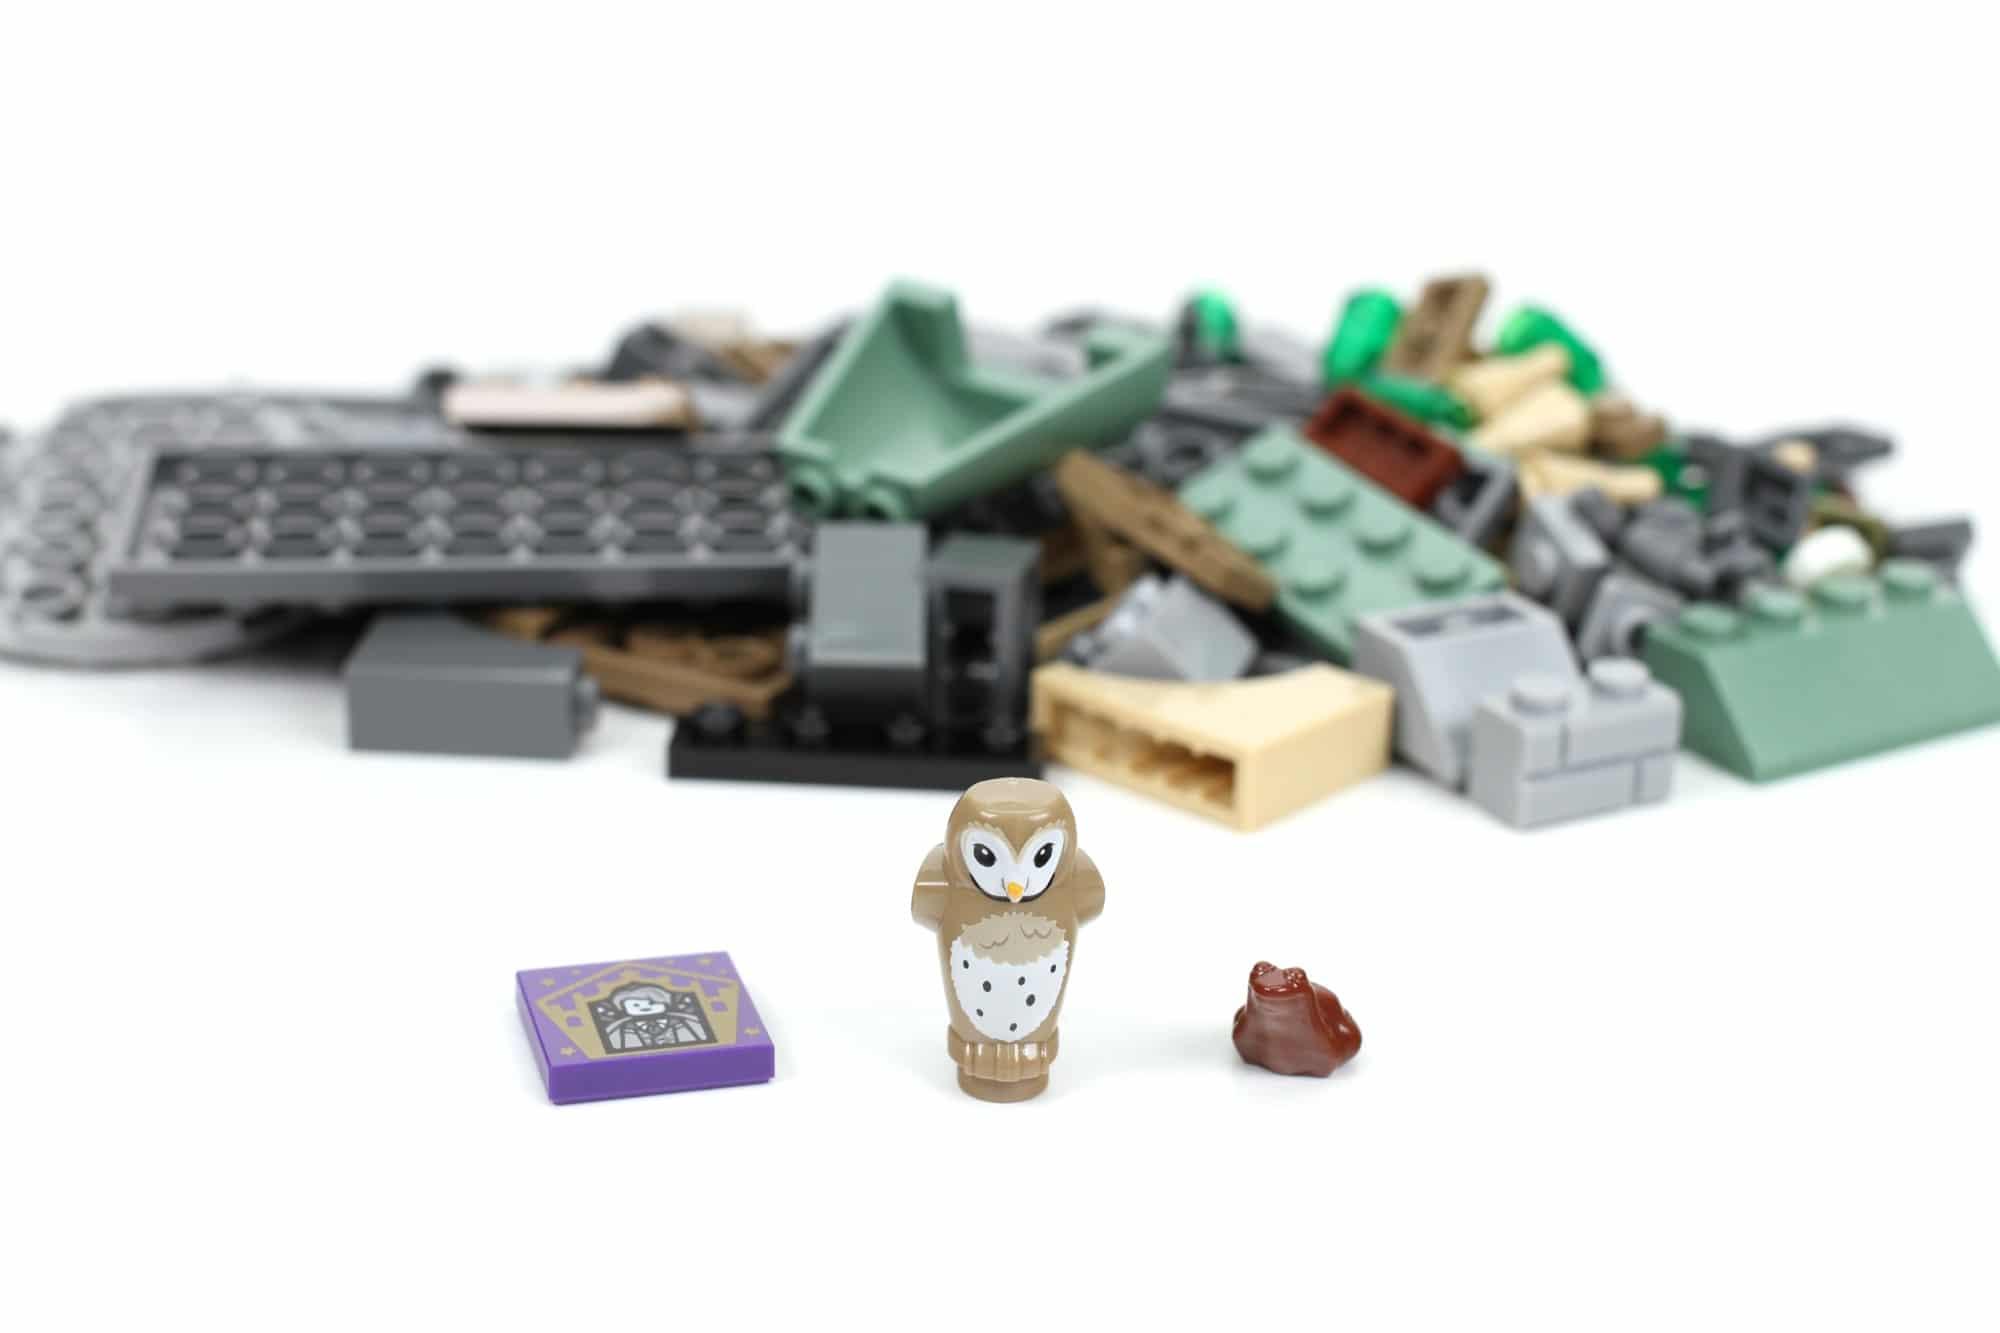 LEGO Harry Potter 76389 Hogwarts Kammer Des Schreckens Schritt 7 1